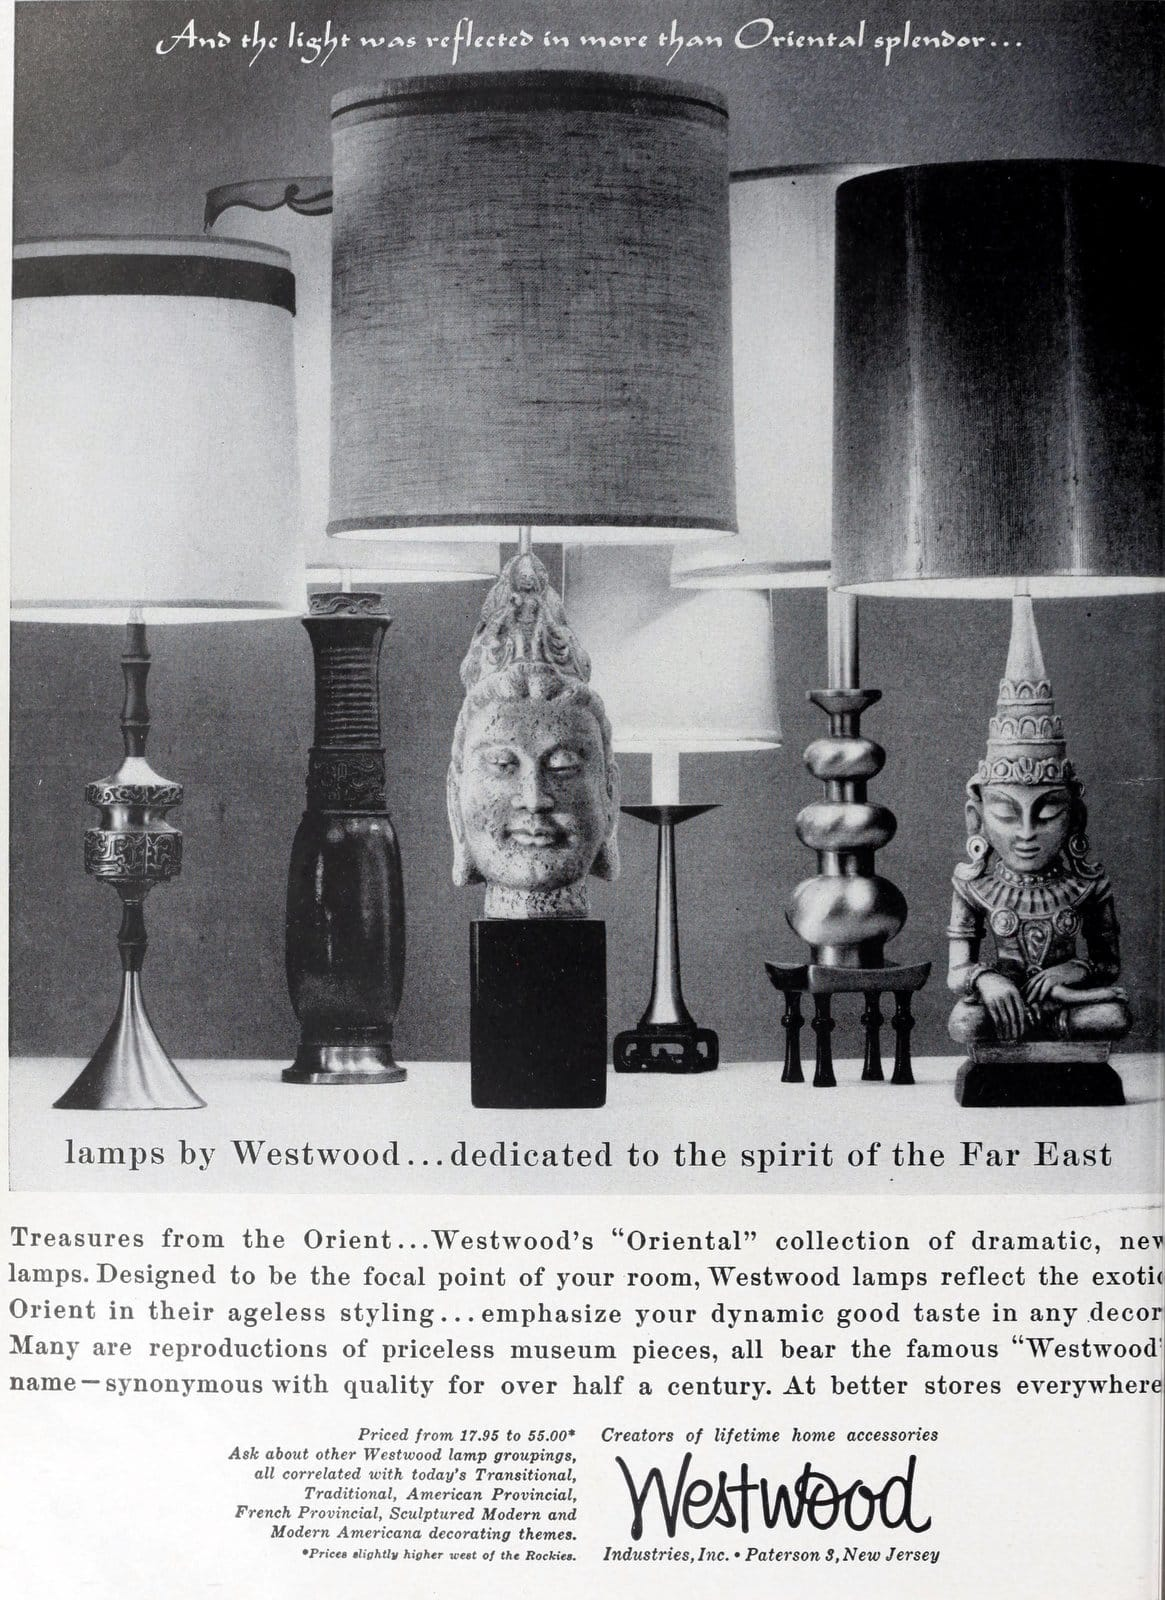 Vintage Westood lamps in Far East decorative styles (1959)